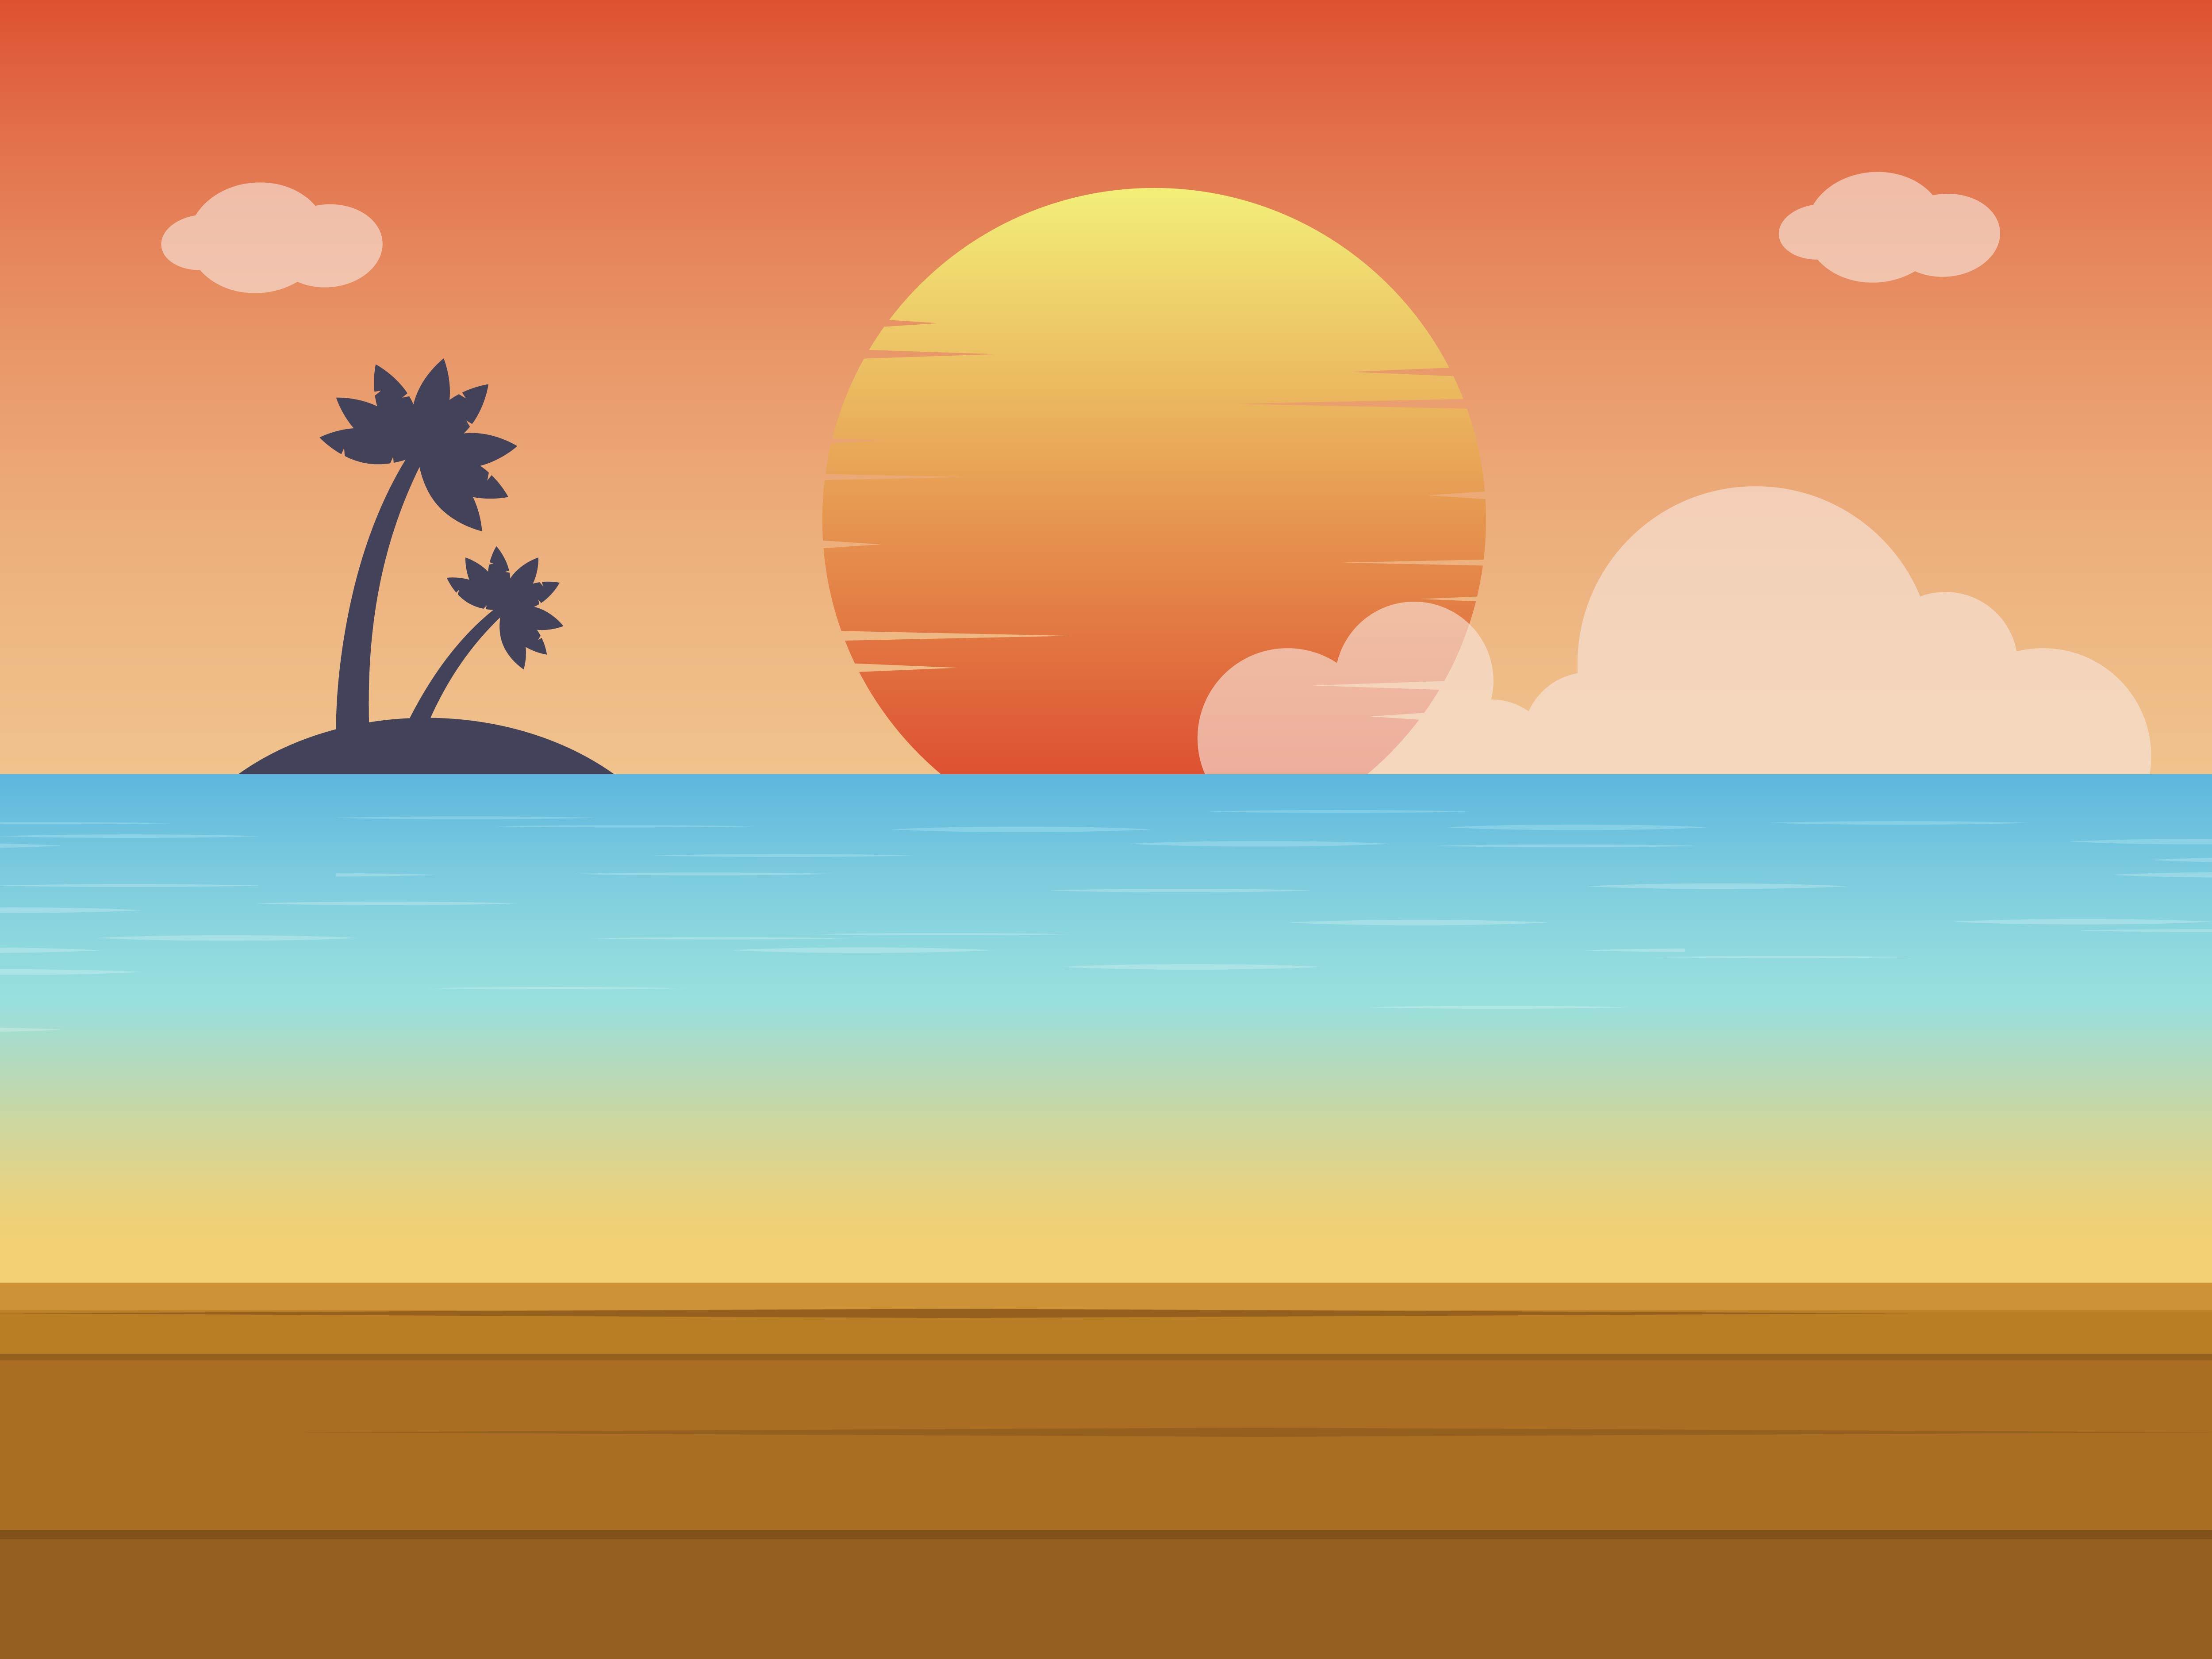 Cross Sunrise Stock Illustrations – 1,455 Cross Sunrise Stock  Illustrations, Vectors & Clipart - Dreamstime